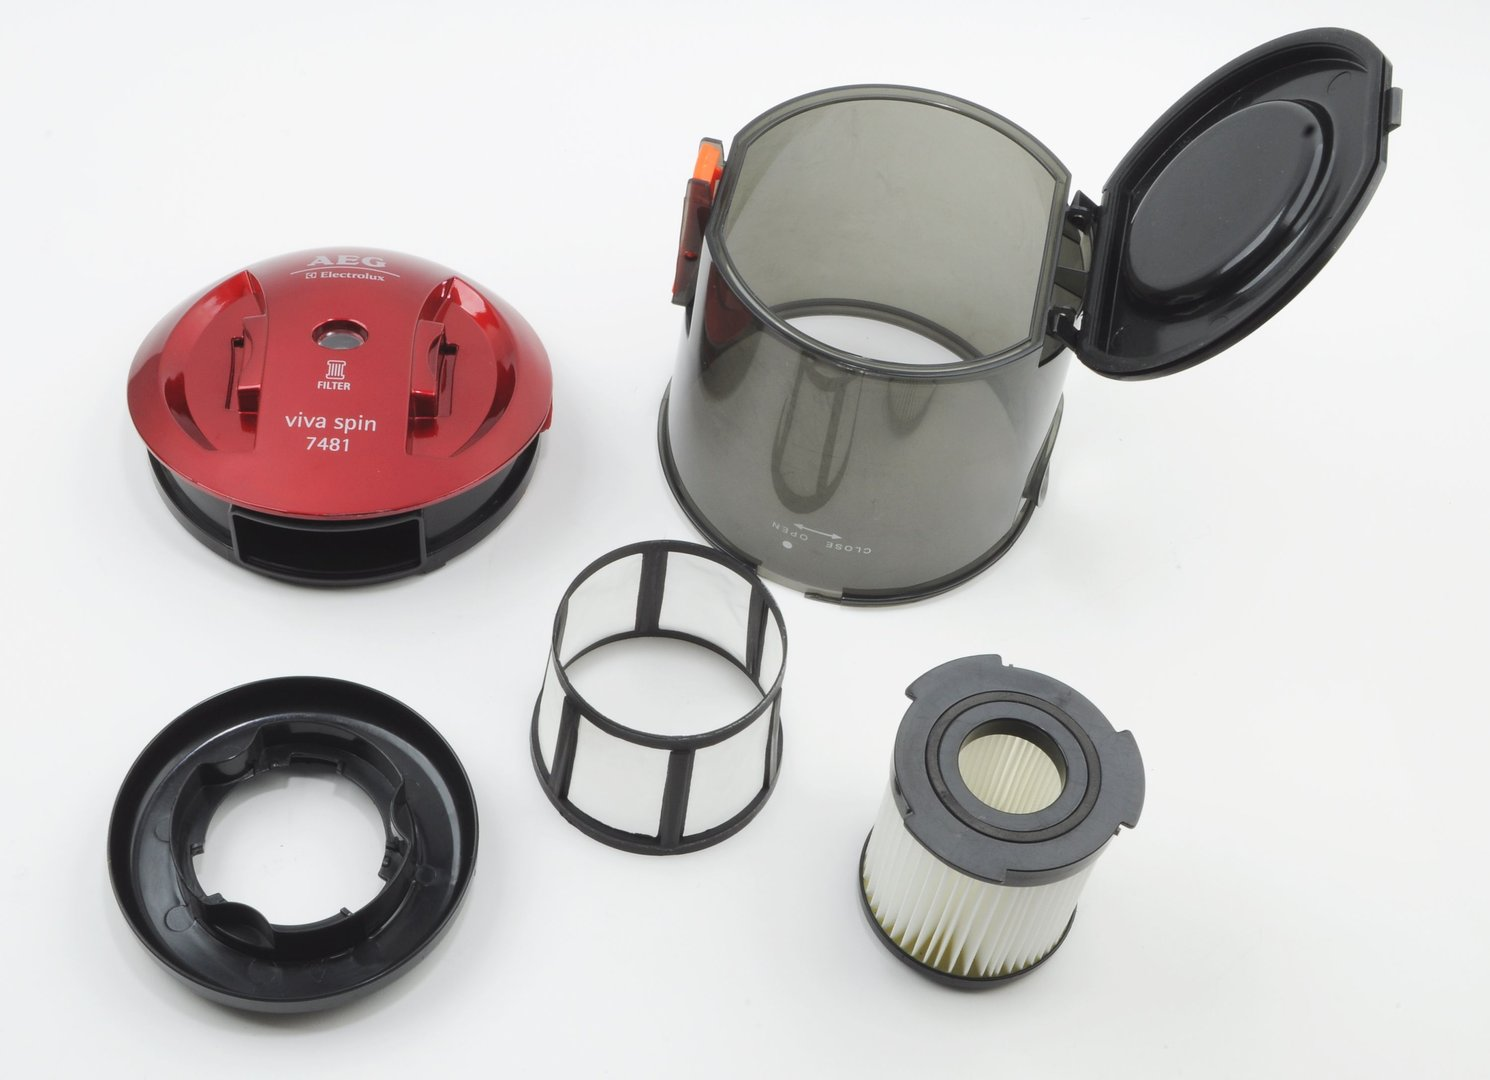 Viva dunstabzugshaube filter wechseln electrolux kohlefilter